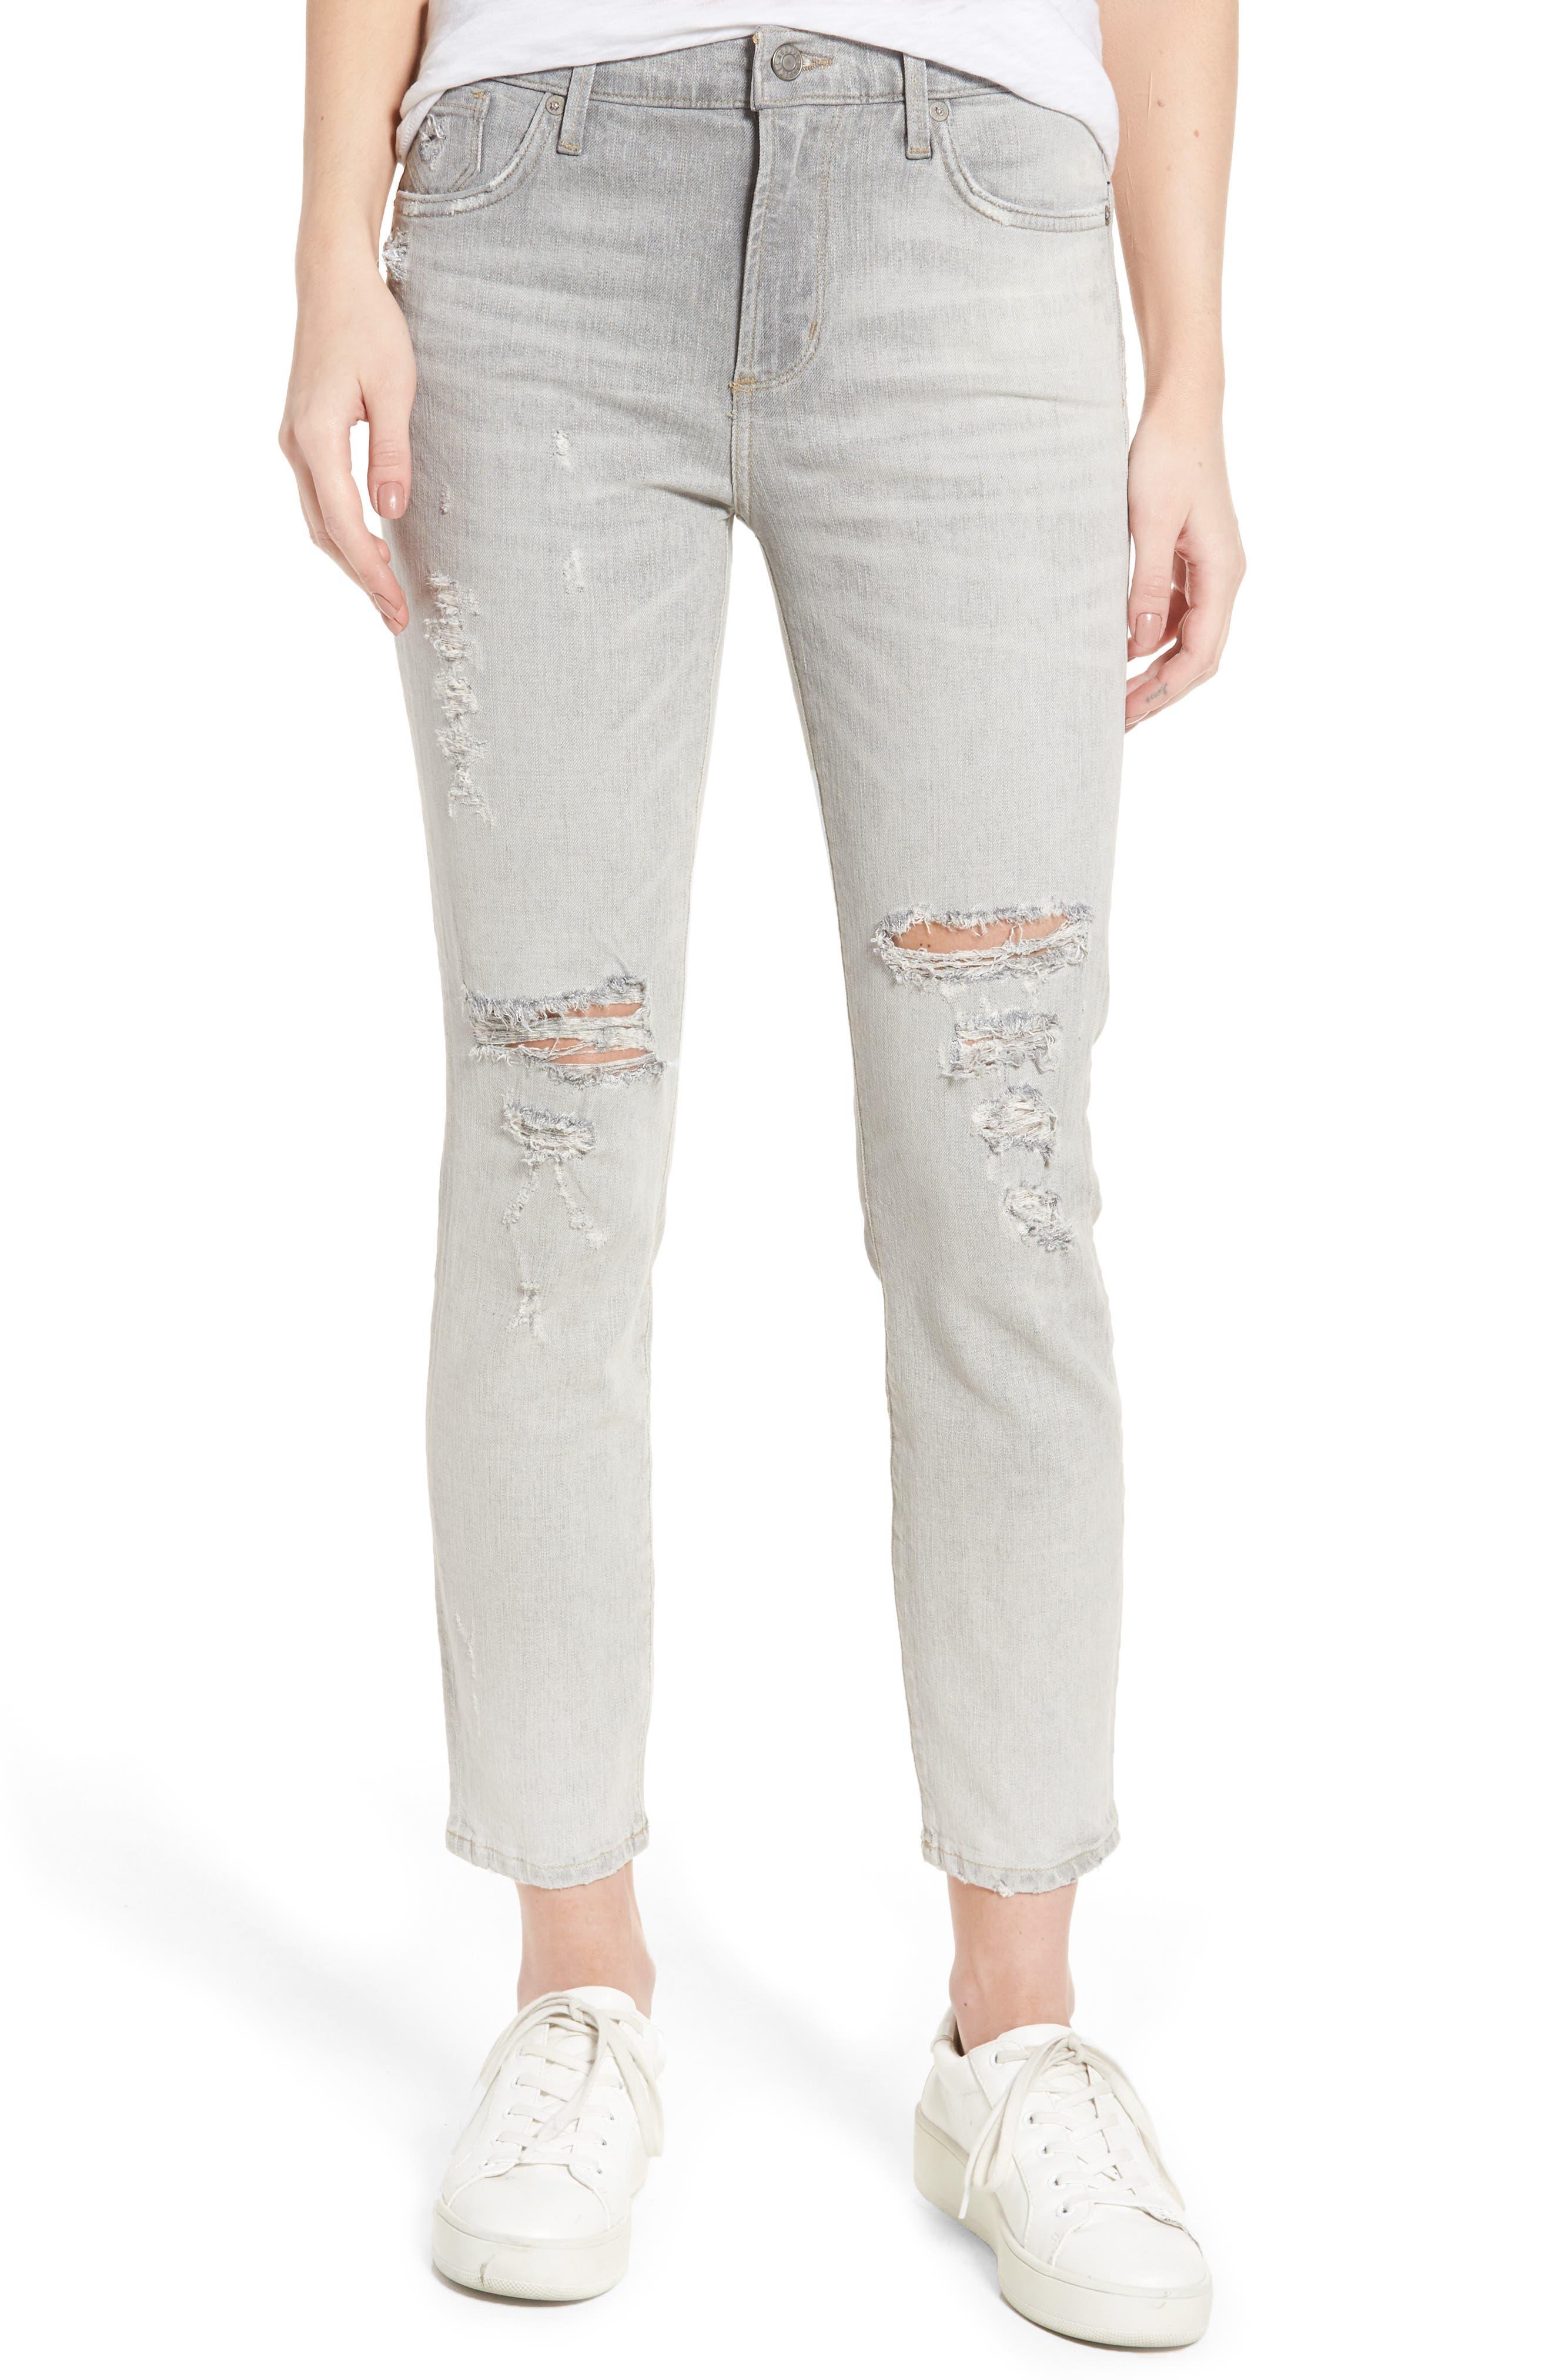 Sophie High Waist Skinny Jeans,                             Main thumbnail 1, color,                             Portland Destruct